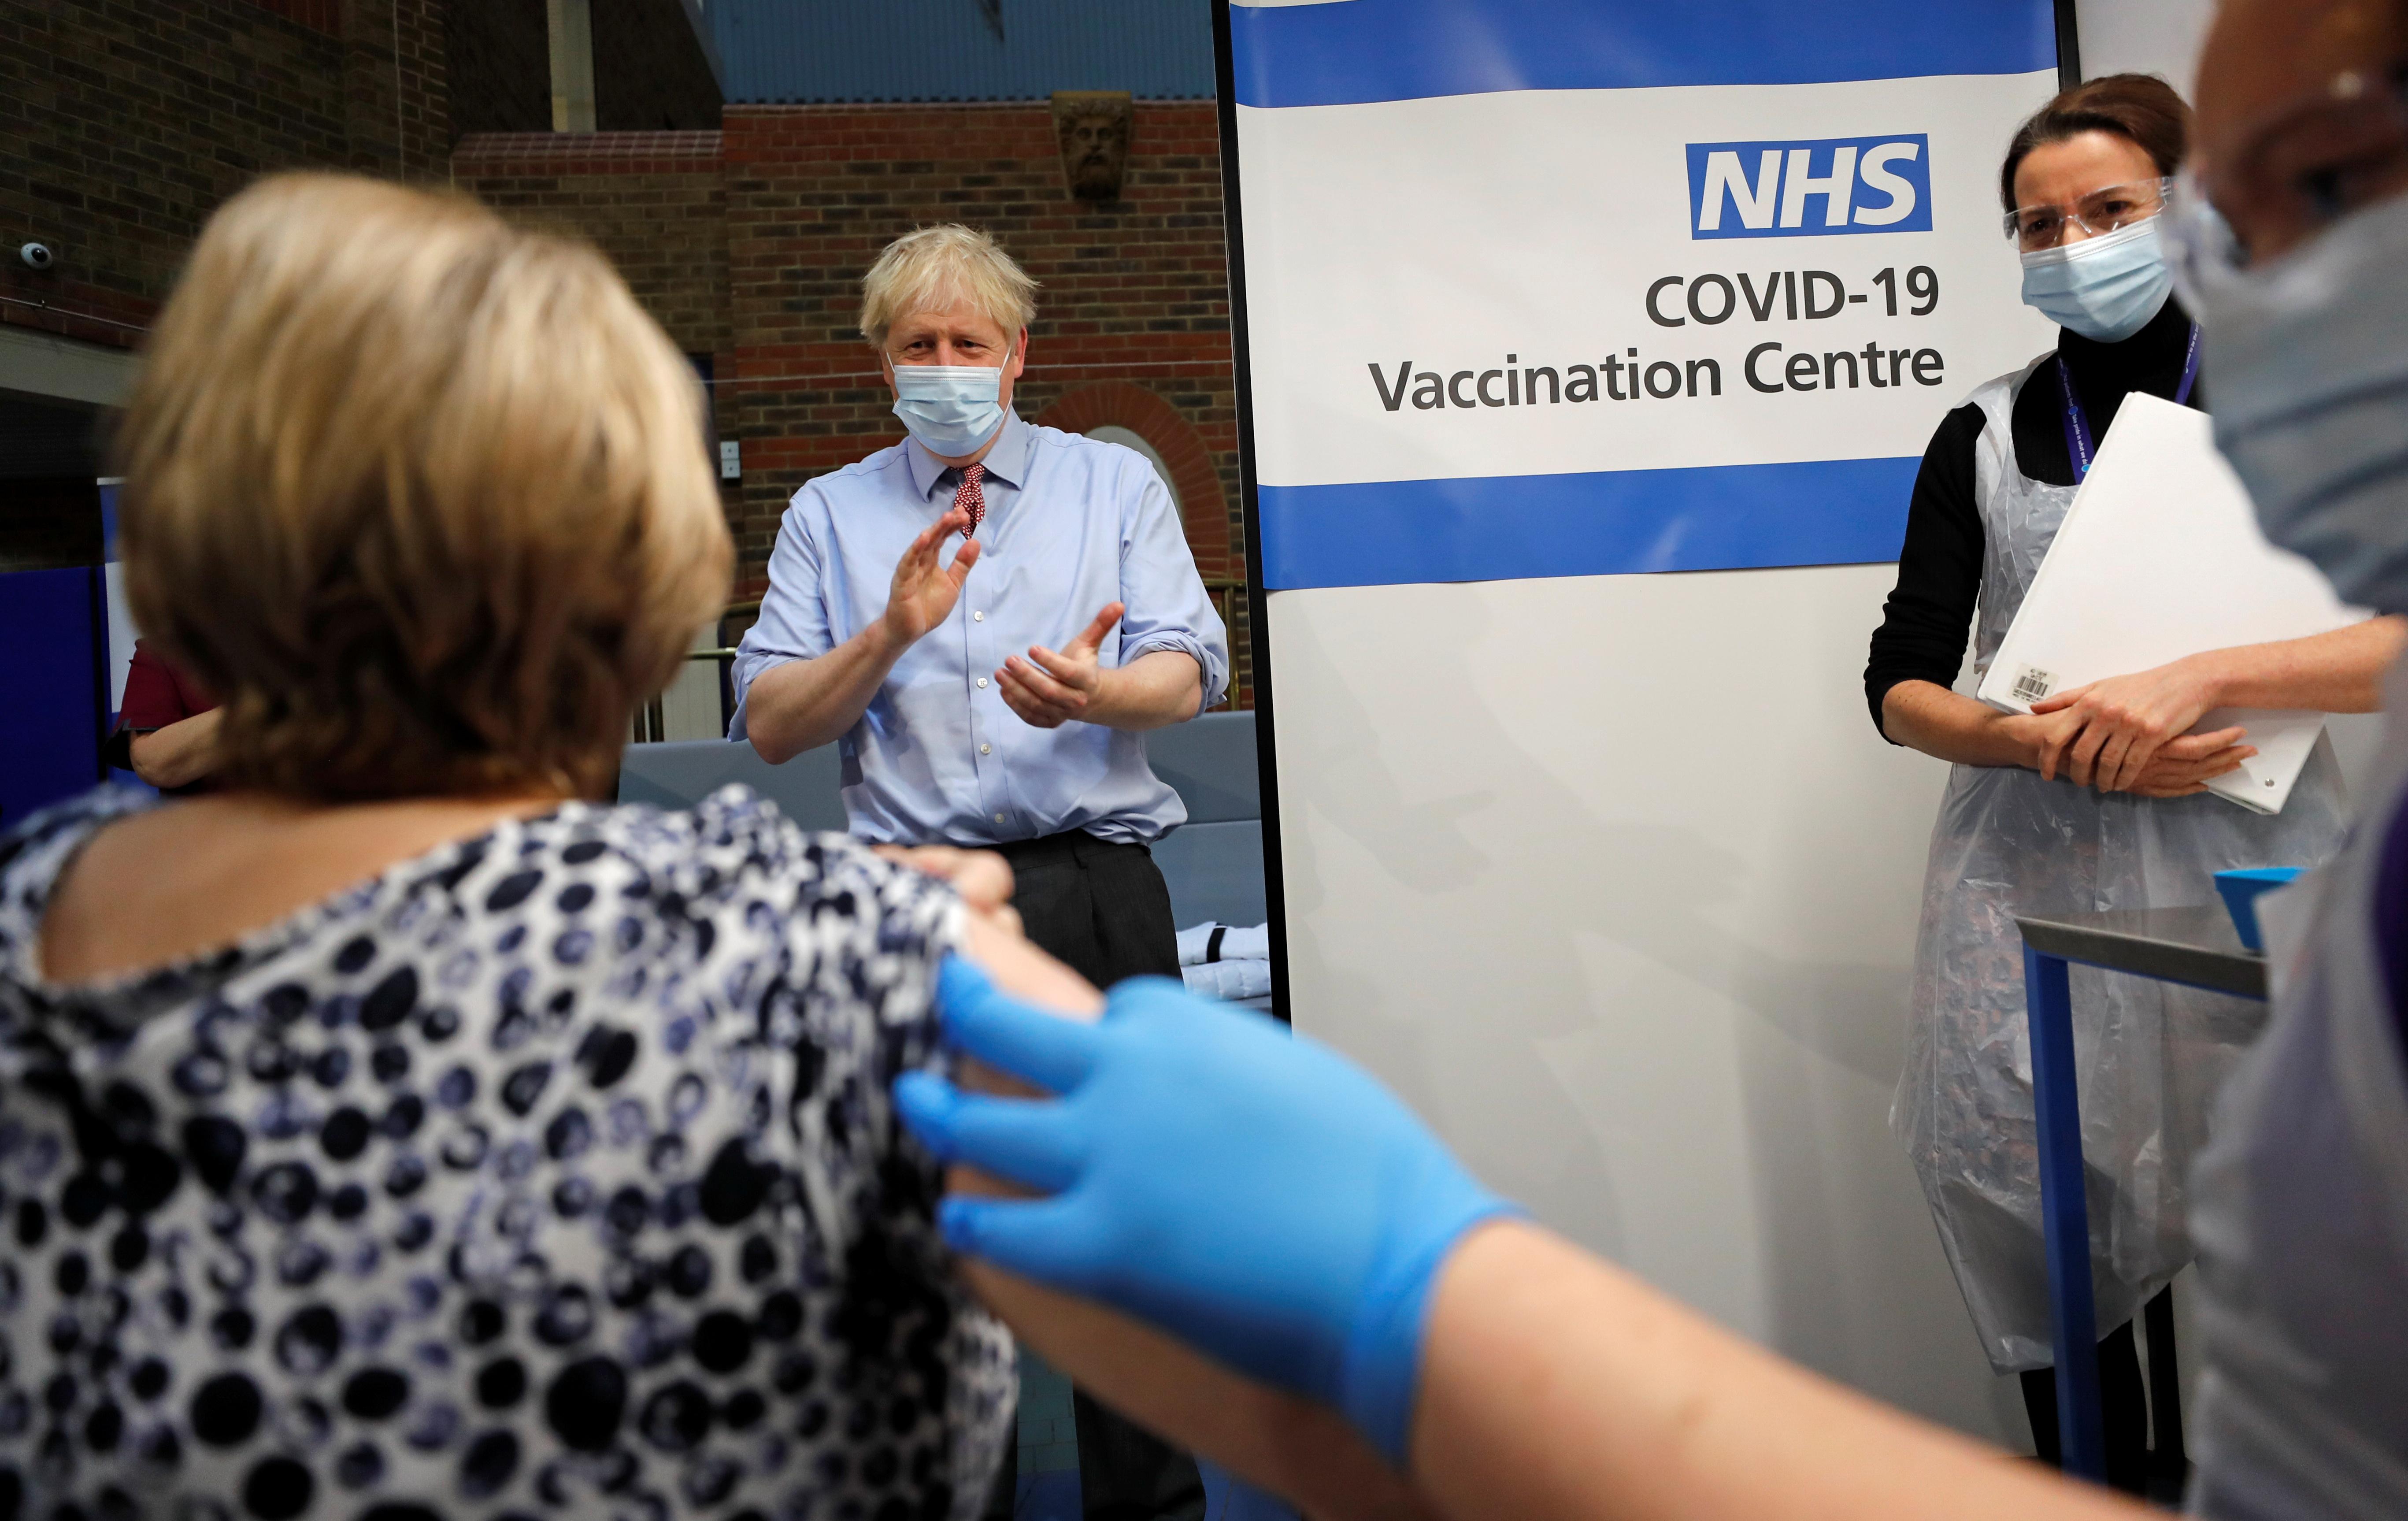 British prime minister Boris Johnson claps after a nurse administers the Pfizer/BioNTech Covid-19 vaccine.